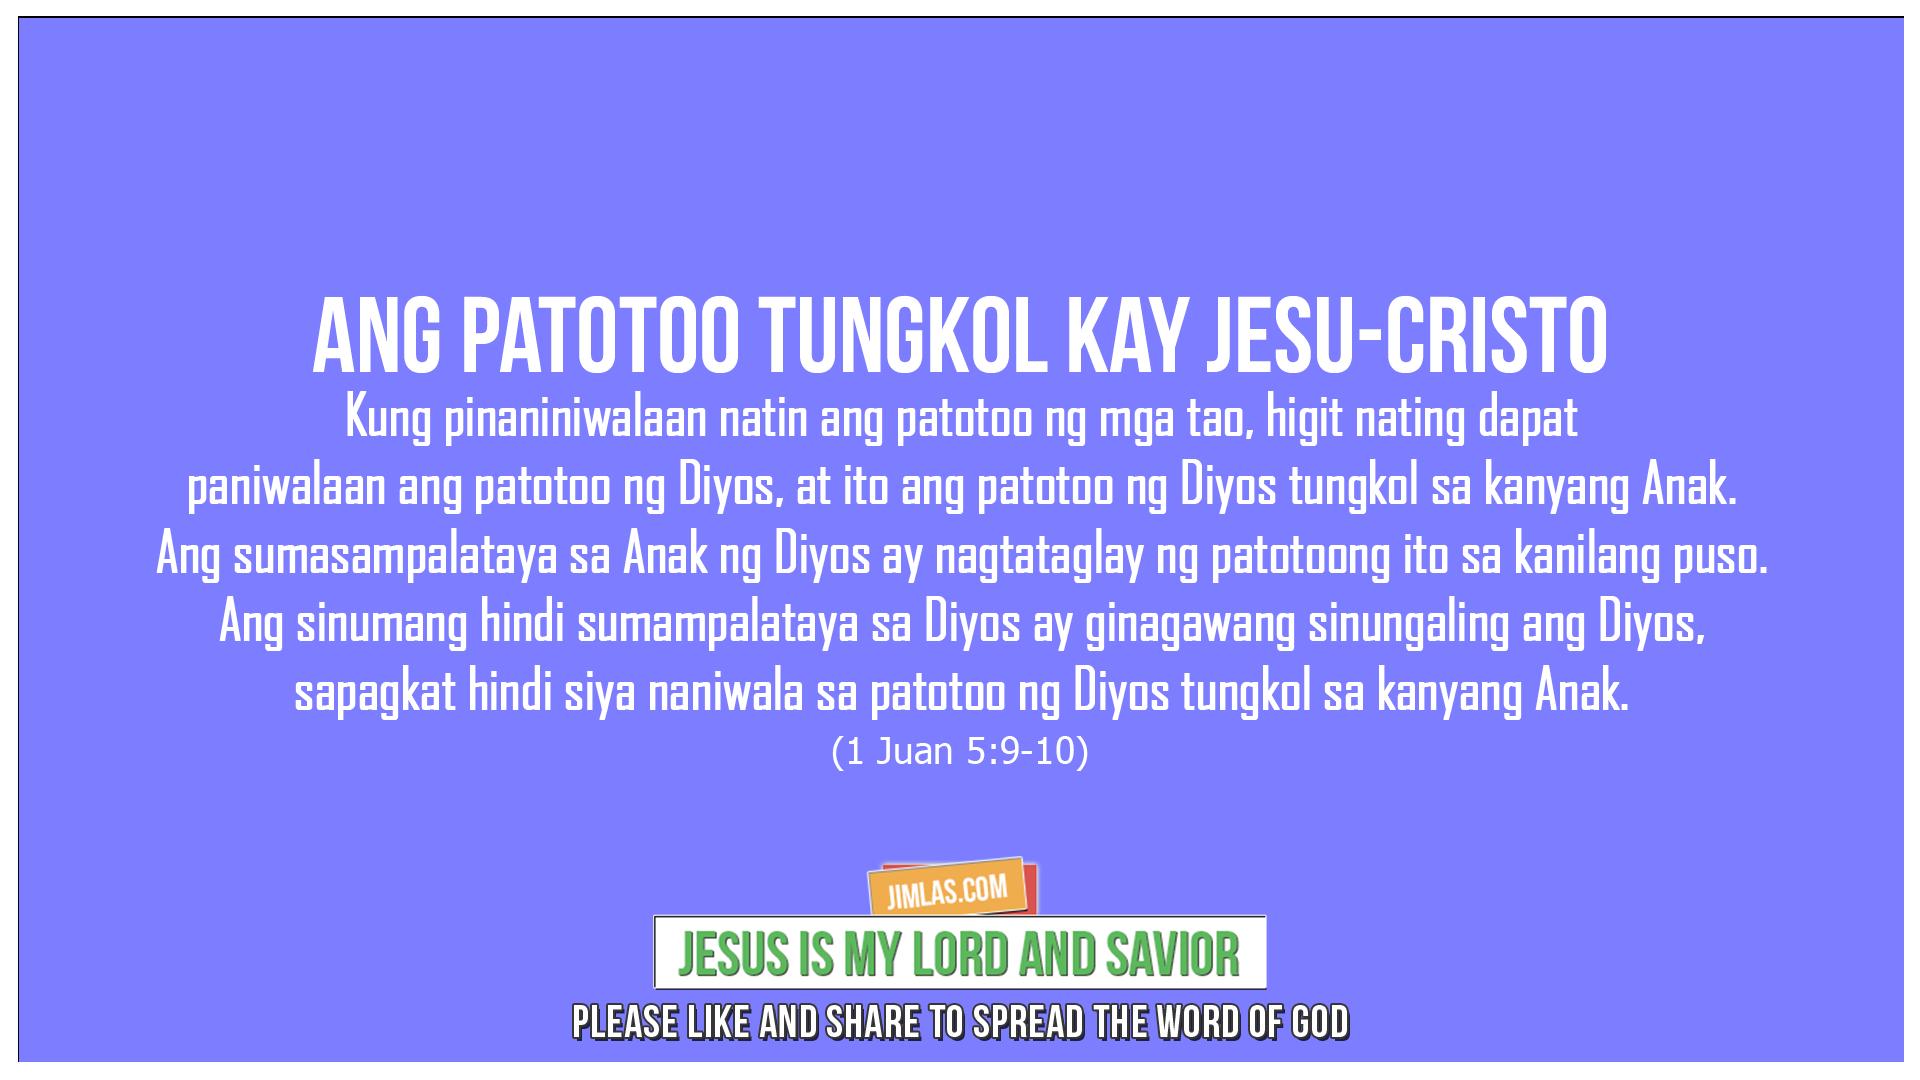 1 Juan 5:9-10, 1 Juan 5:9-10